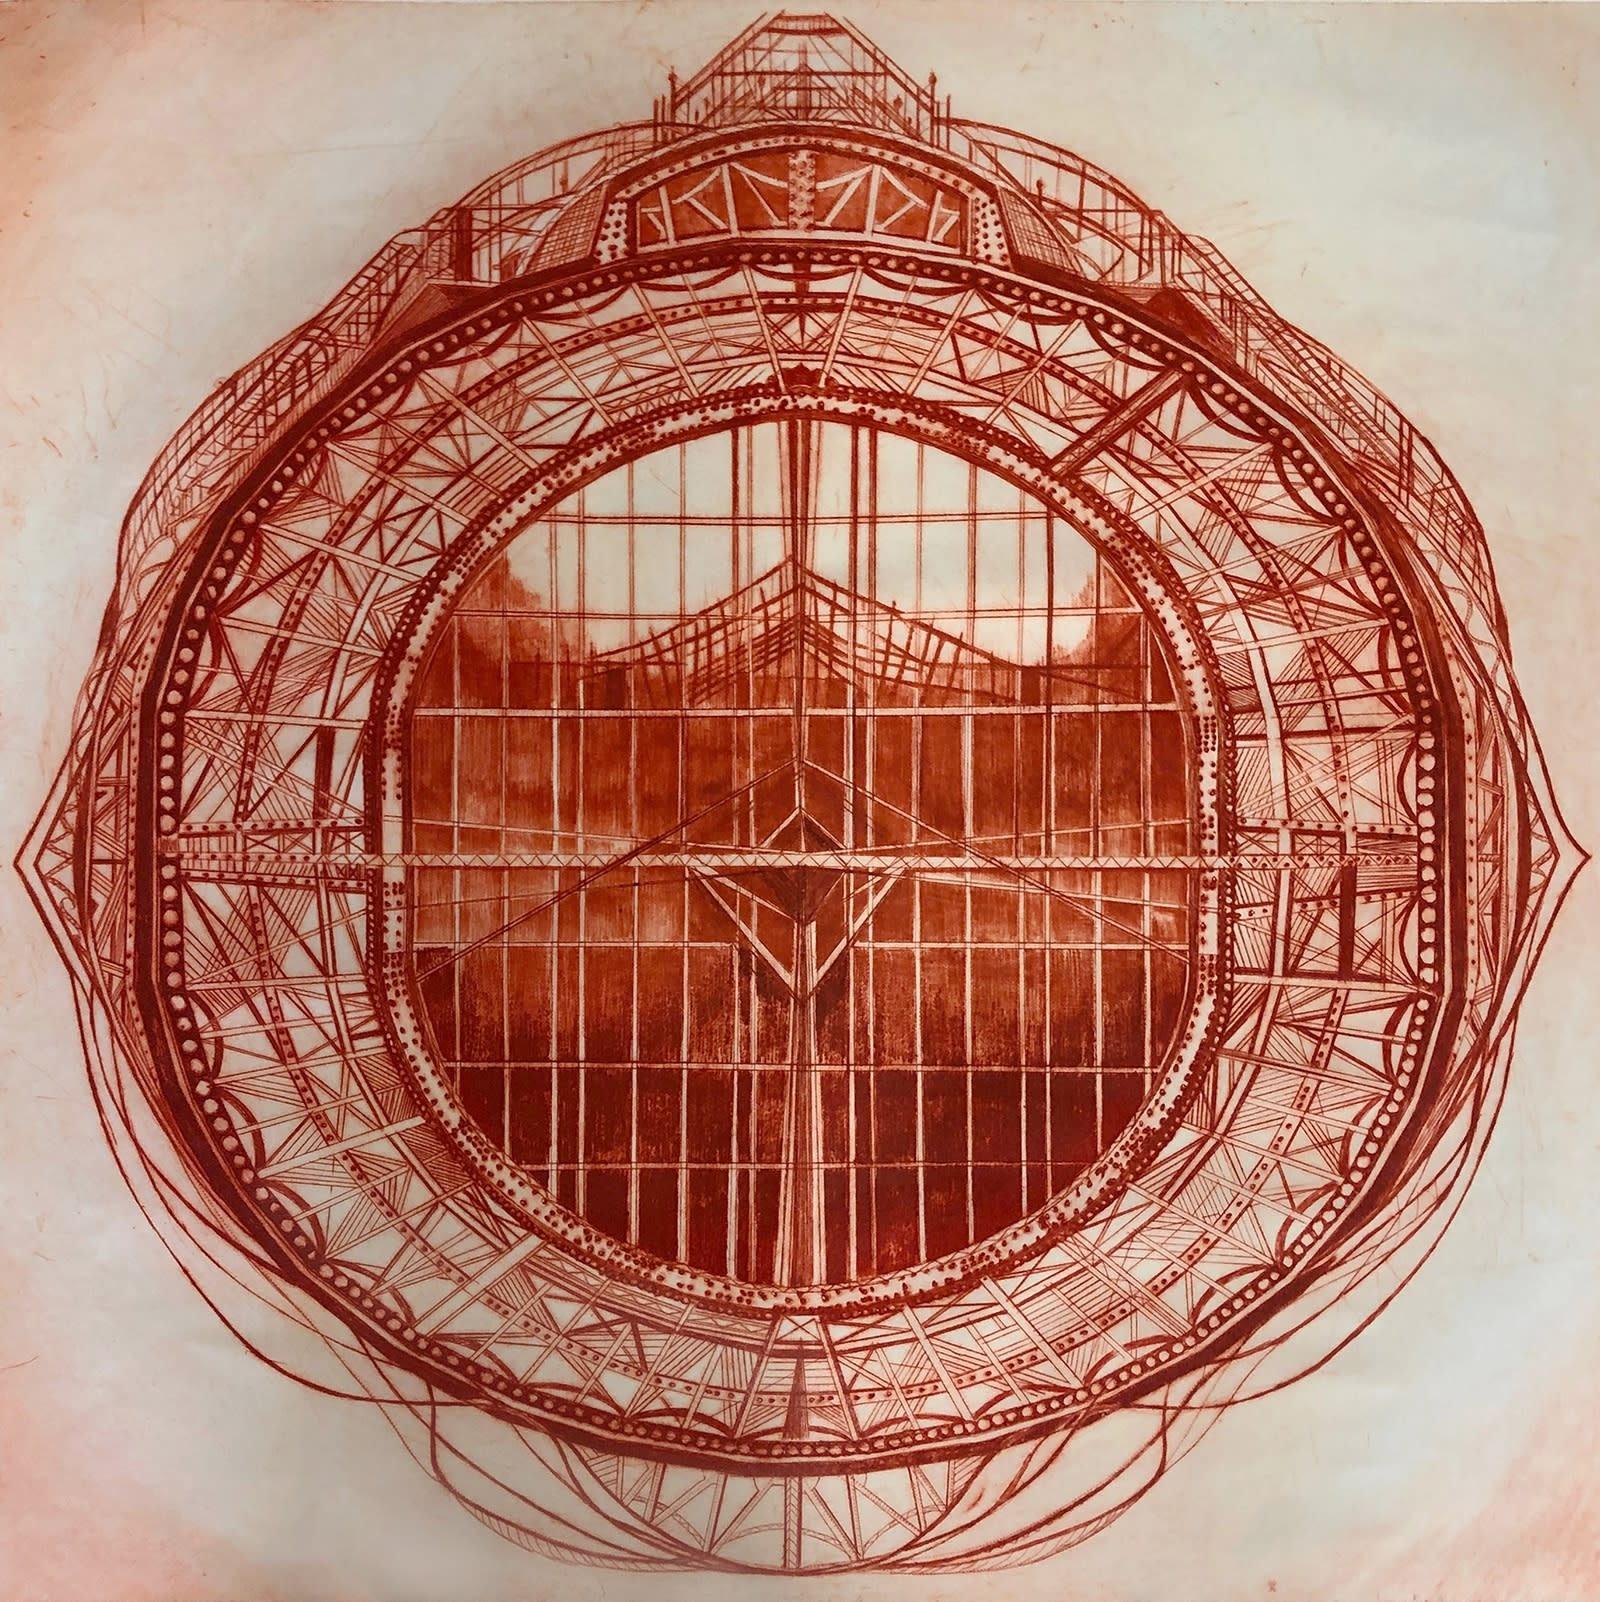 "<span class=""link fancybox-details-link""><a href=""/exhibitions/20/works/artworks_standalone10848/"">View Detail Page</a></span><div class=""artist""><span class=""artist""><strong>Jenny Robinson RE</strong></span></div><div class=""title""><em>#1 The Rotondo Portfolio</em></div><div class=""medium"">drypoint on Japanese paper</div><div class=""dimensions"">61 x 61 cm image size<br></div><div class=""edition_details"">edition of 7</div>"